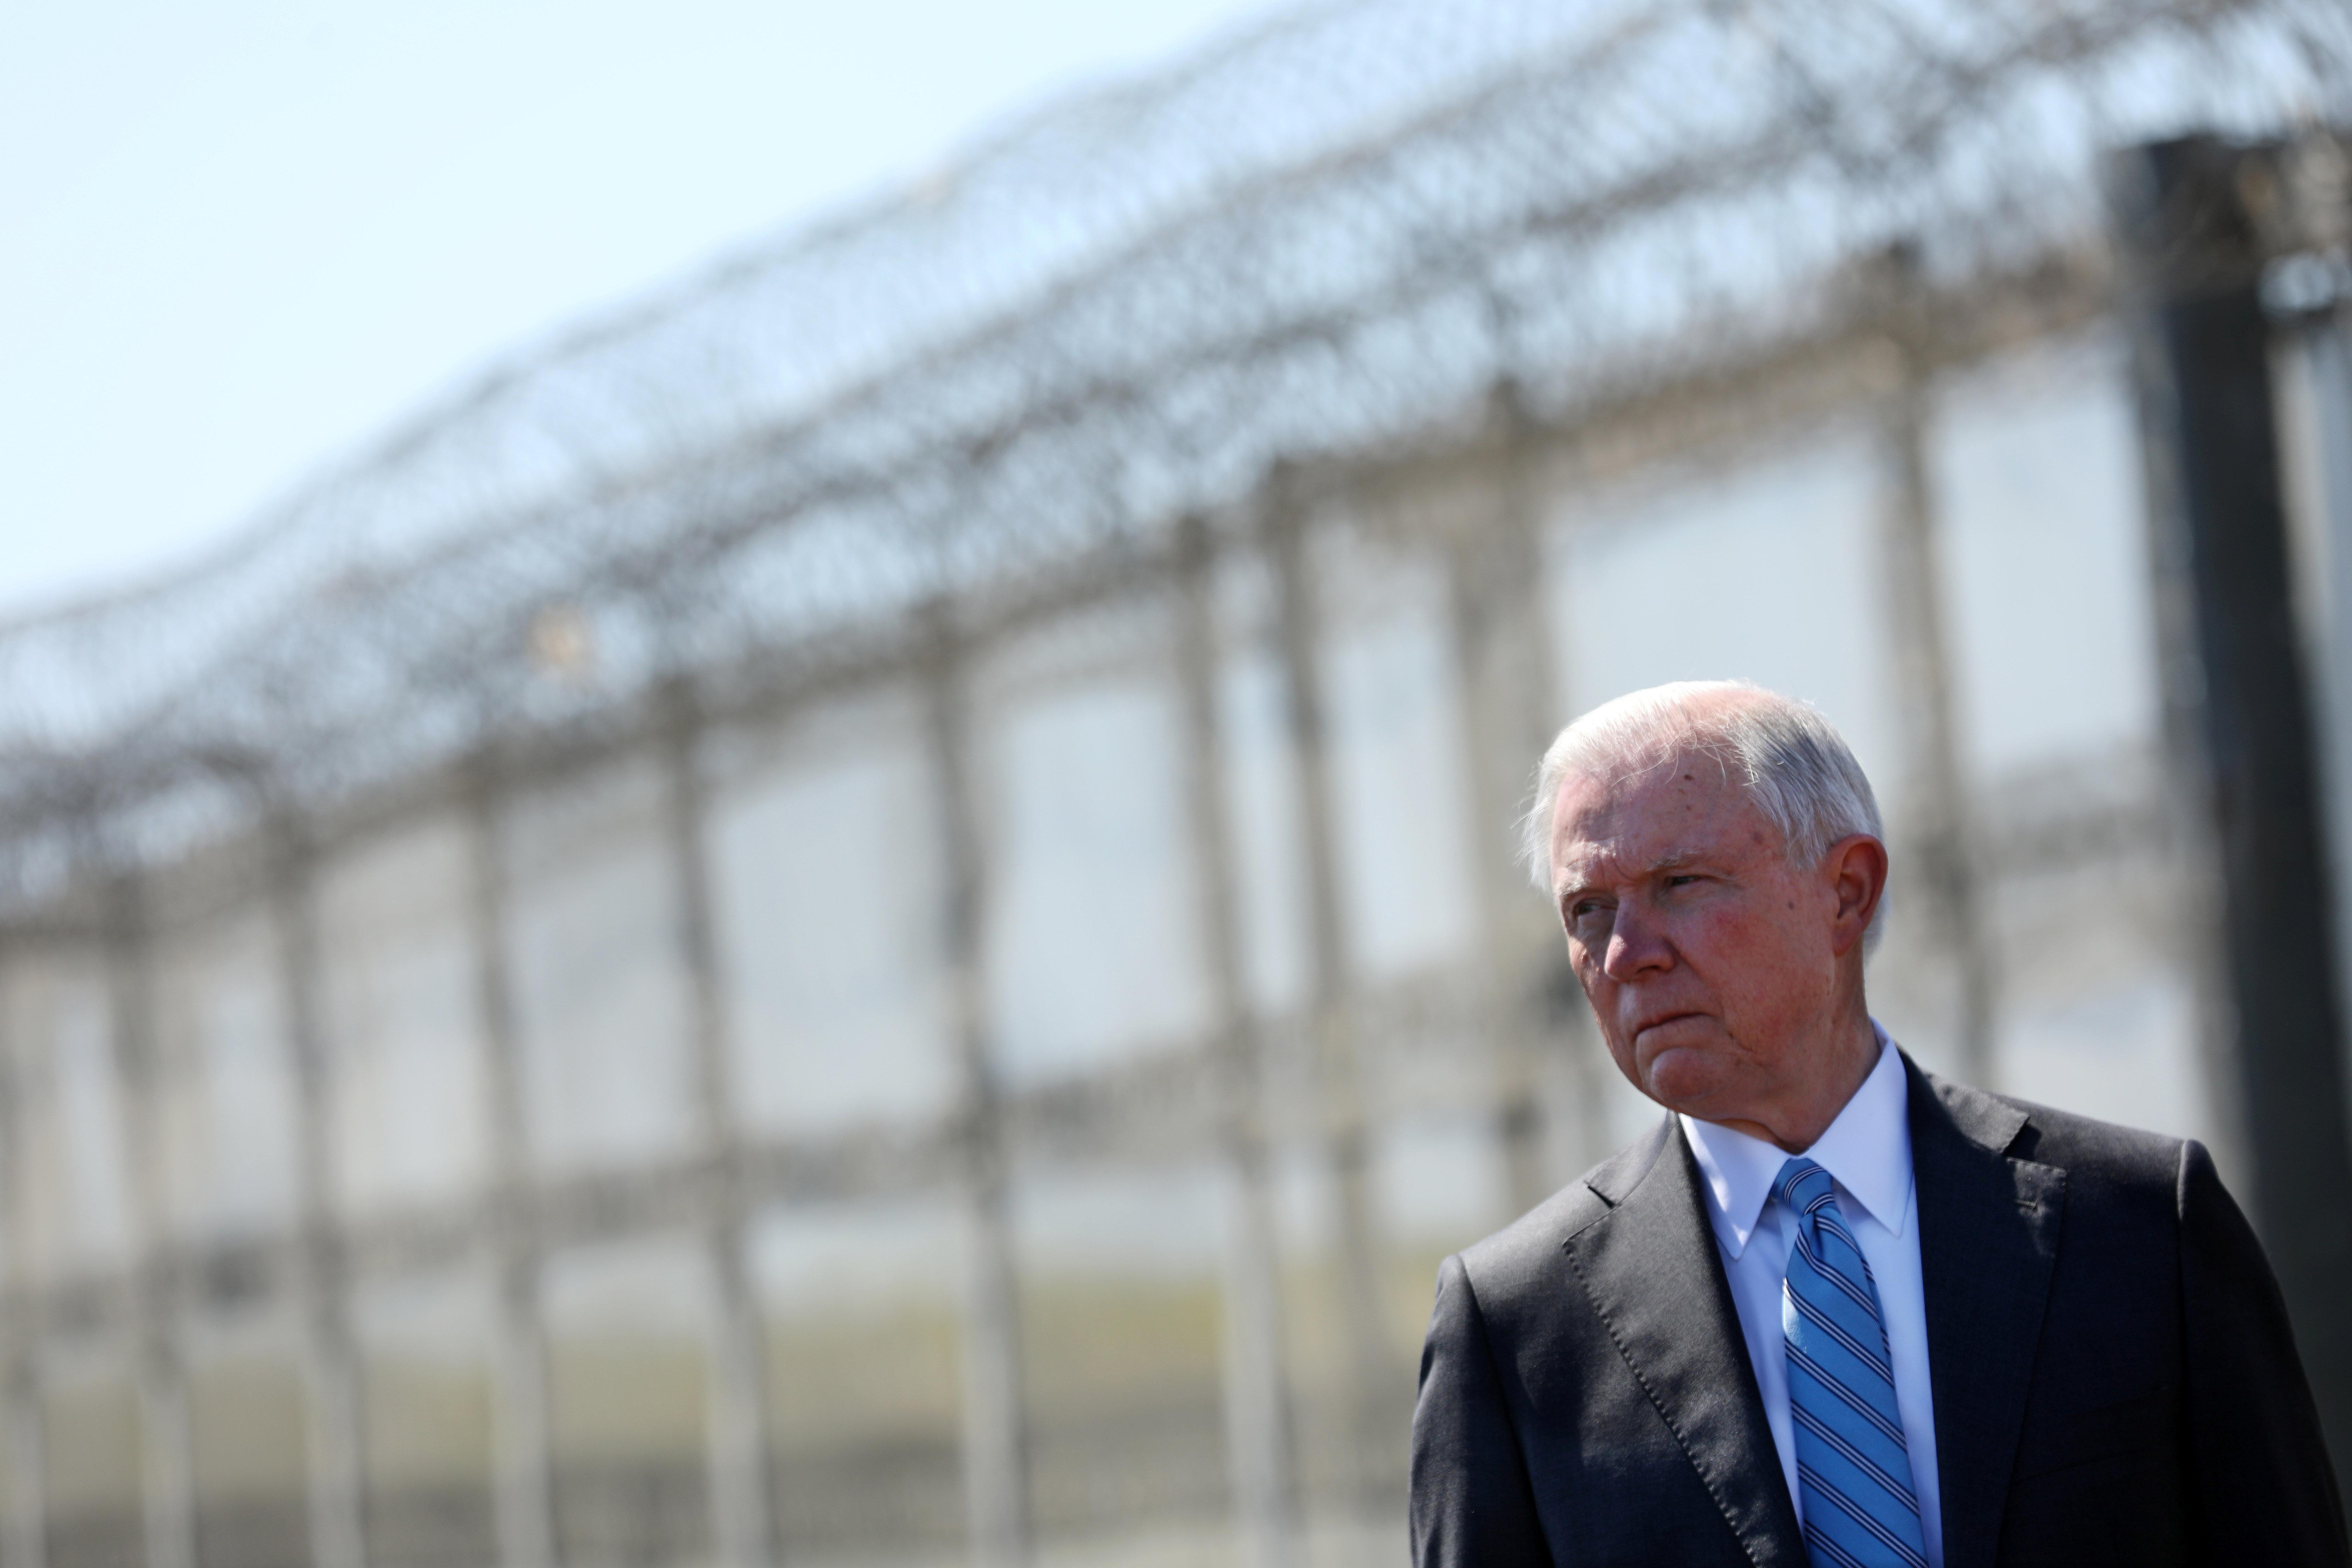 "Attorney General Jeff Sessions'memorandum nixes a<a href=""http://courthousenews.com/wp-content/uploads/2017/01/ho"